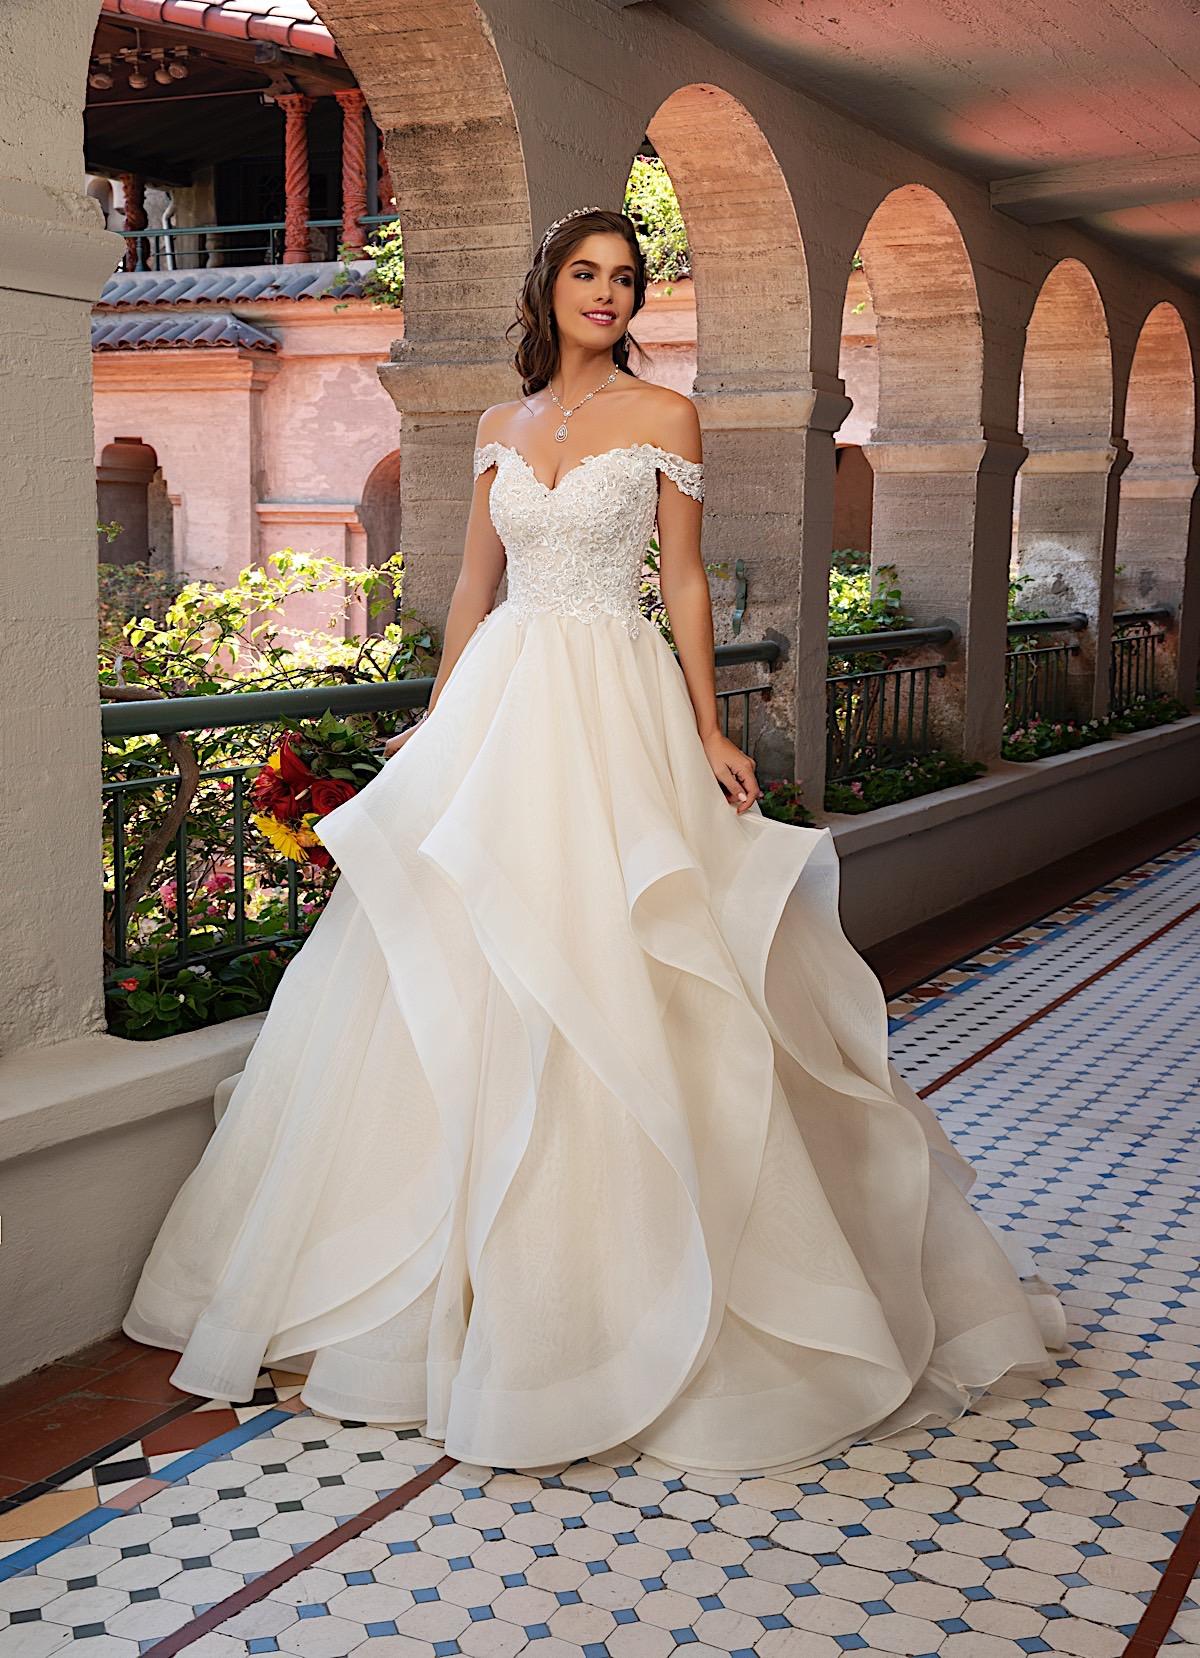 WEDDING DRESS STYLE LEANDRA - The